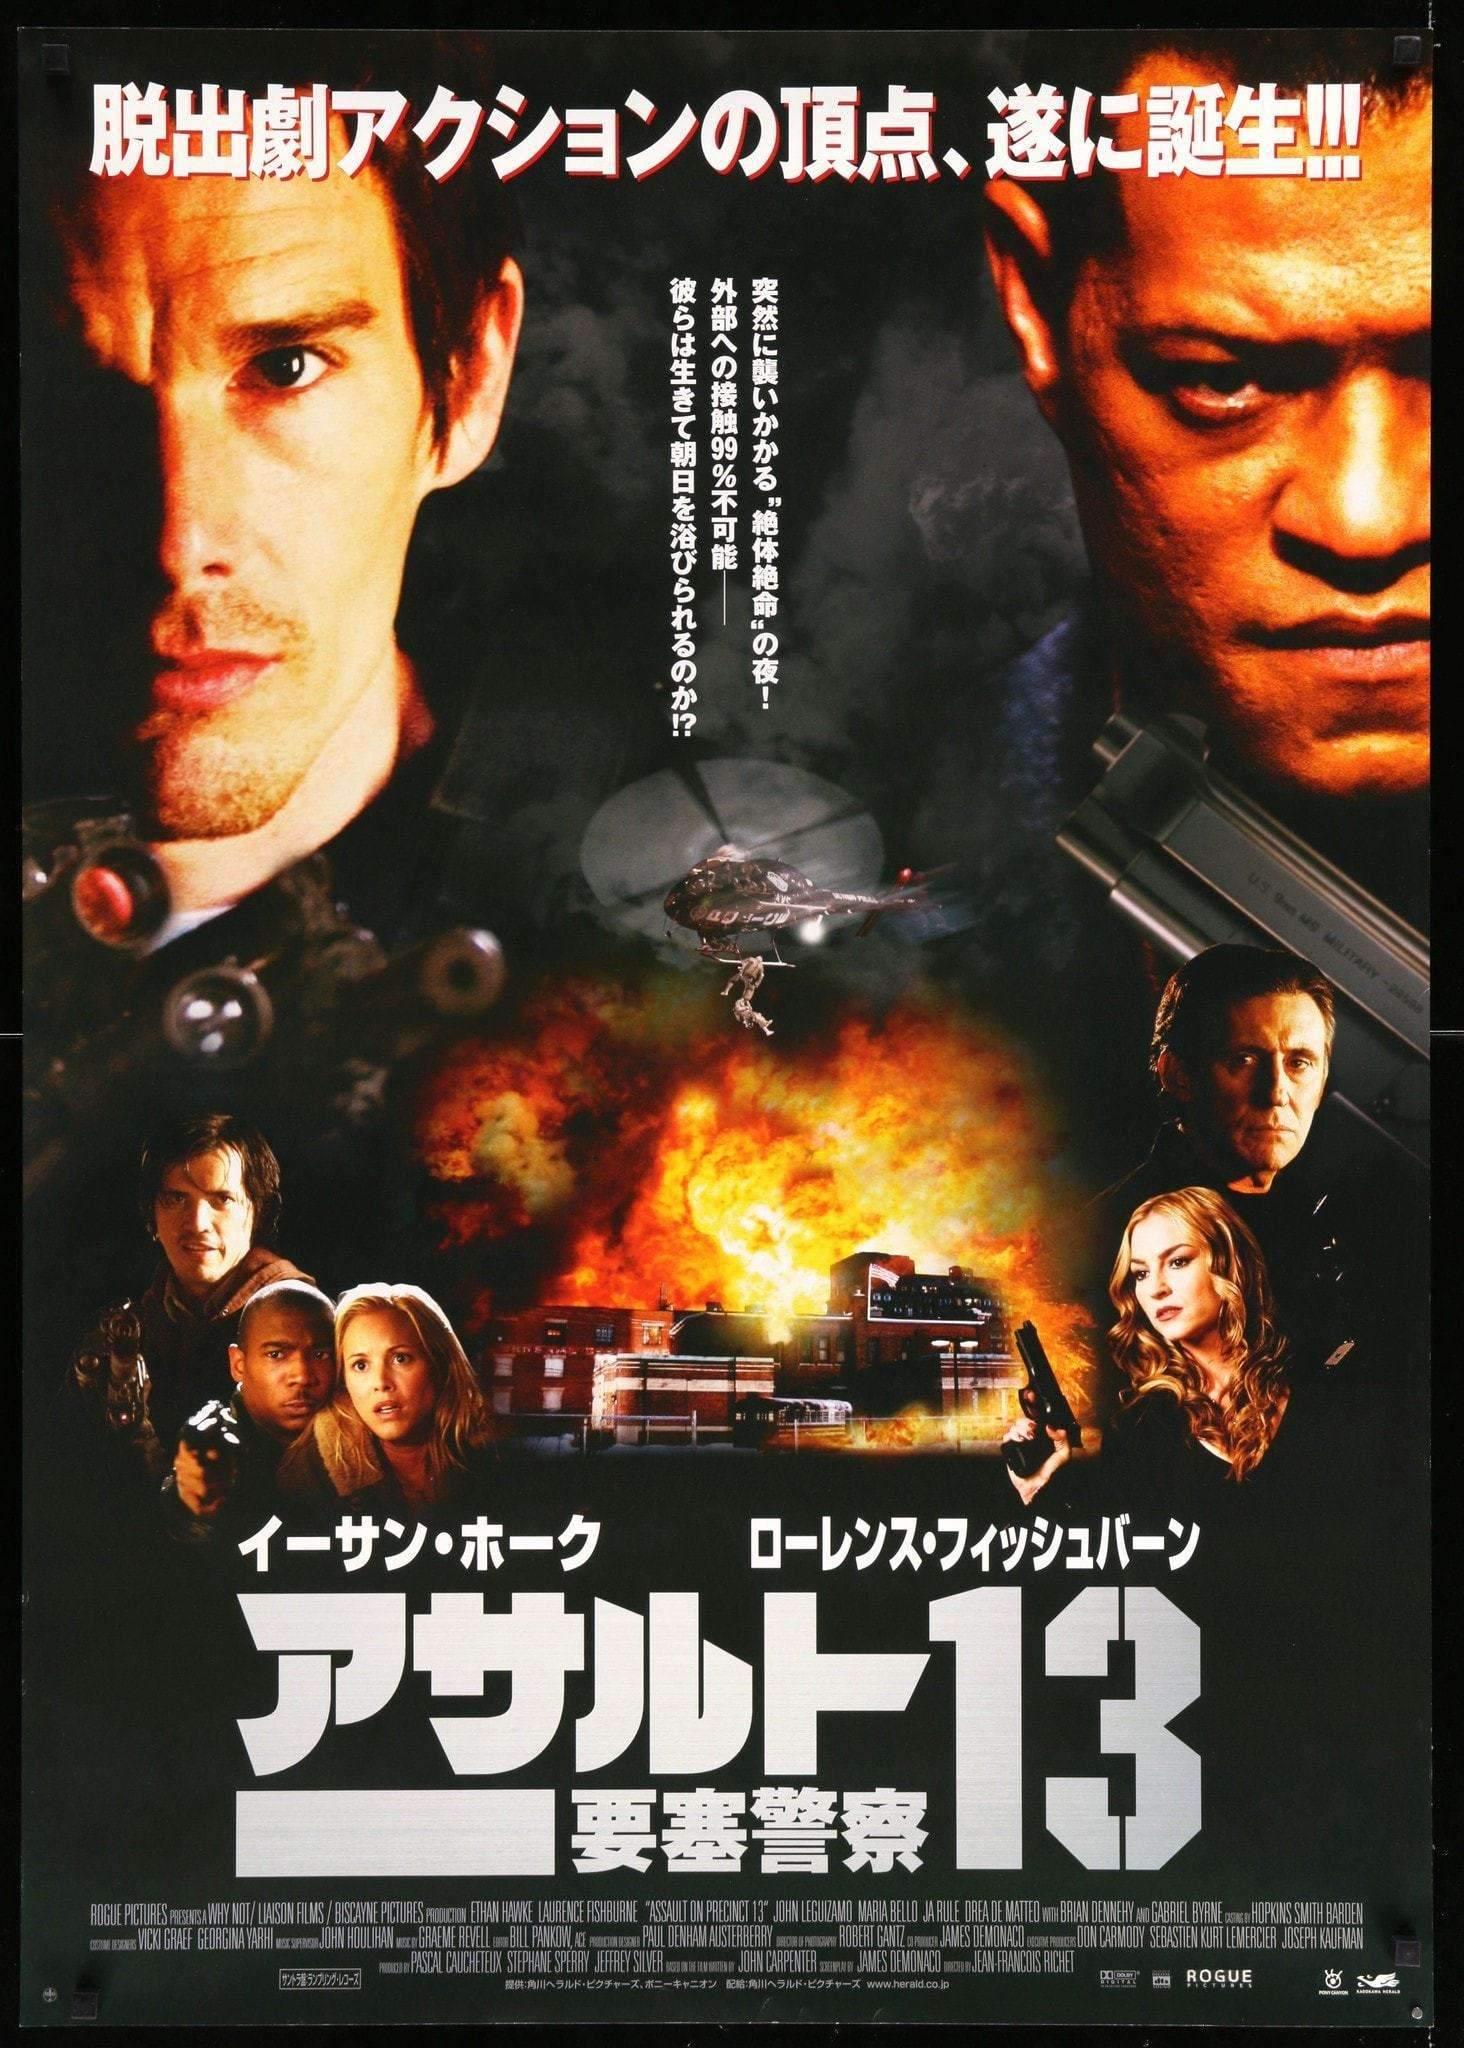 2005_Assualt On Precinct 13 Poster (1).jpg